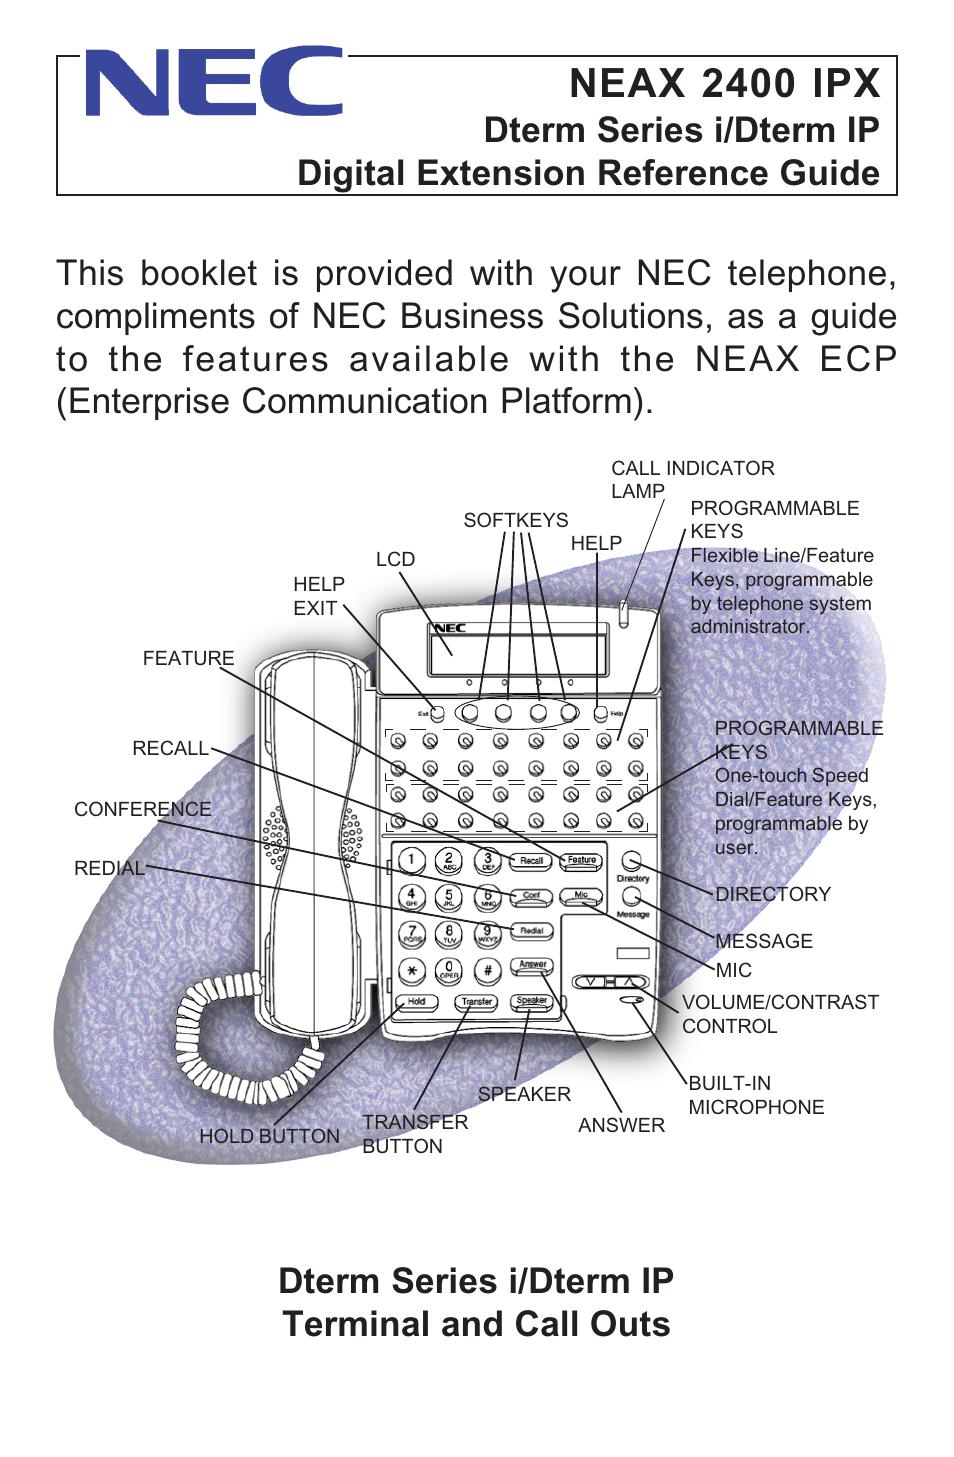 nec neax 2400 ipx user manual 20 pages rh manualsdir com Manual NEC 2400 IPX NEAX 2400 IPX PDF